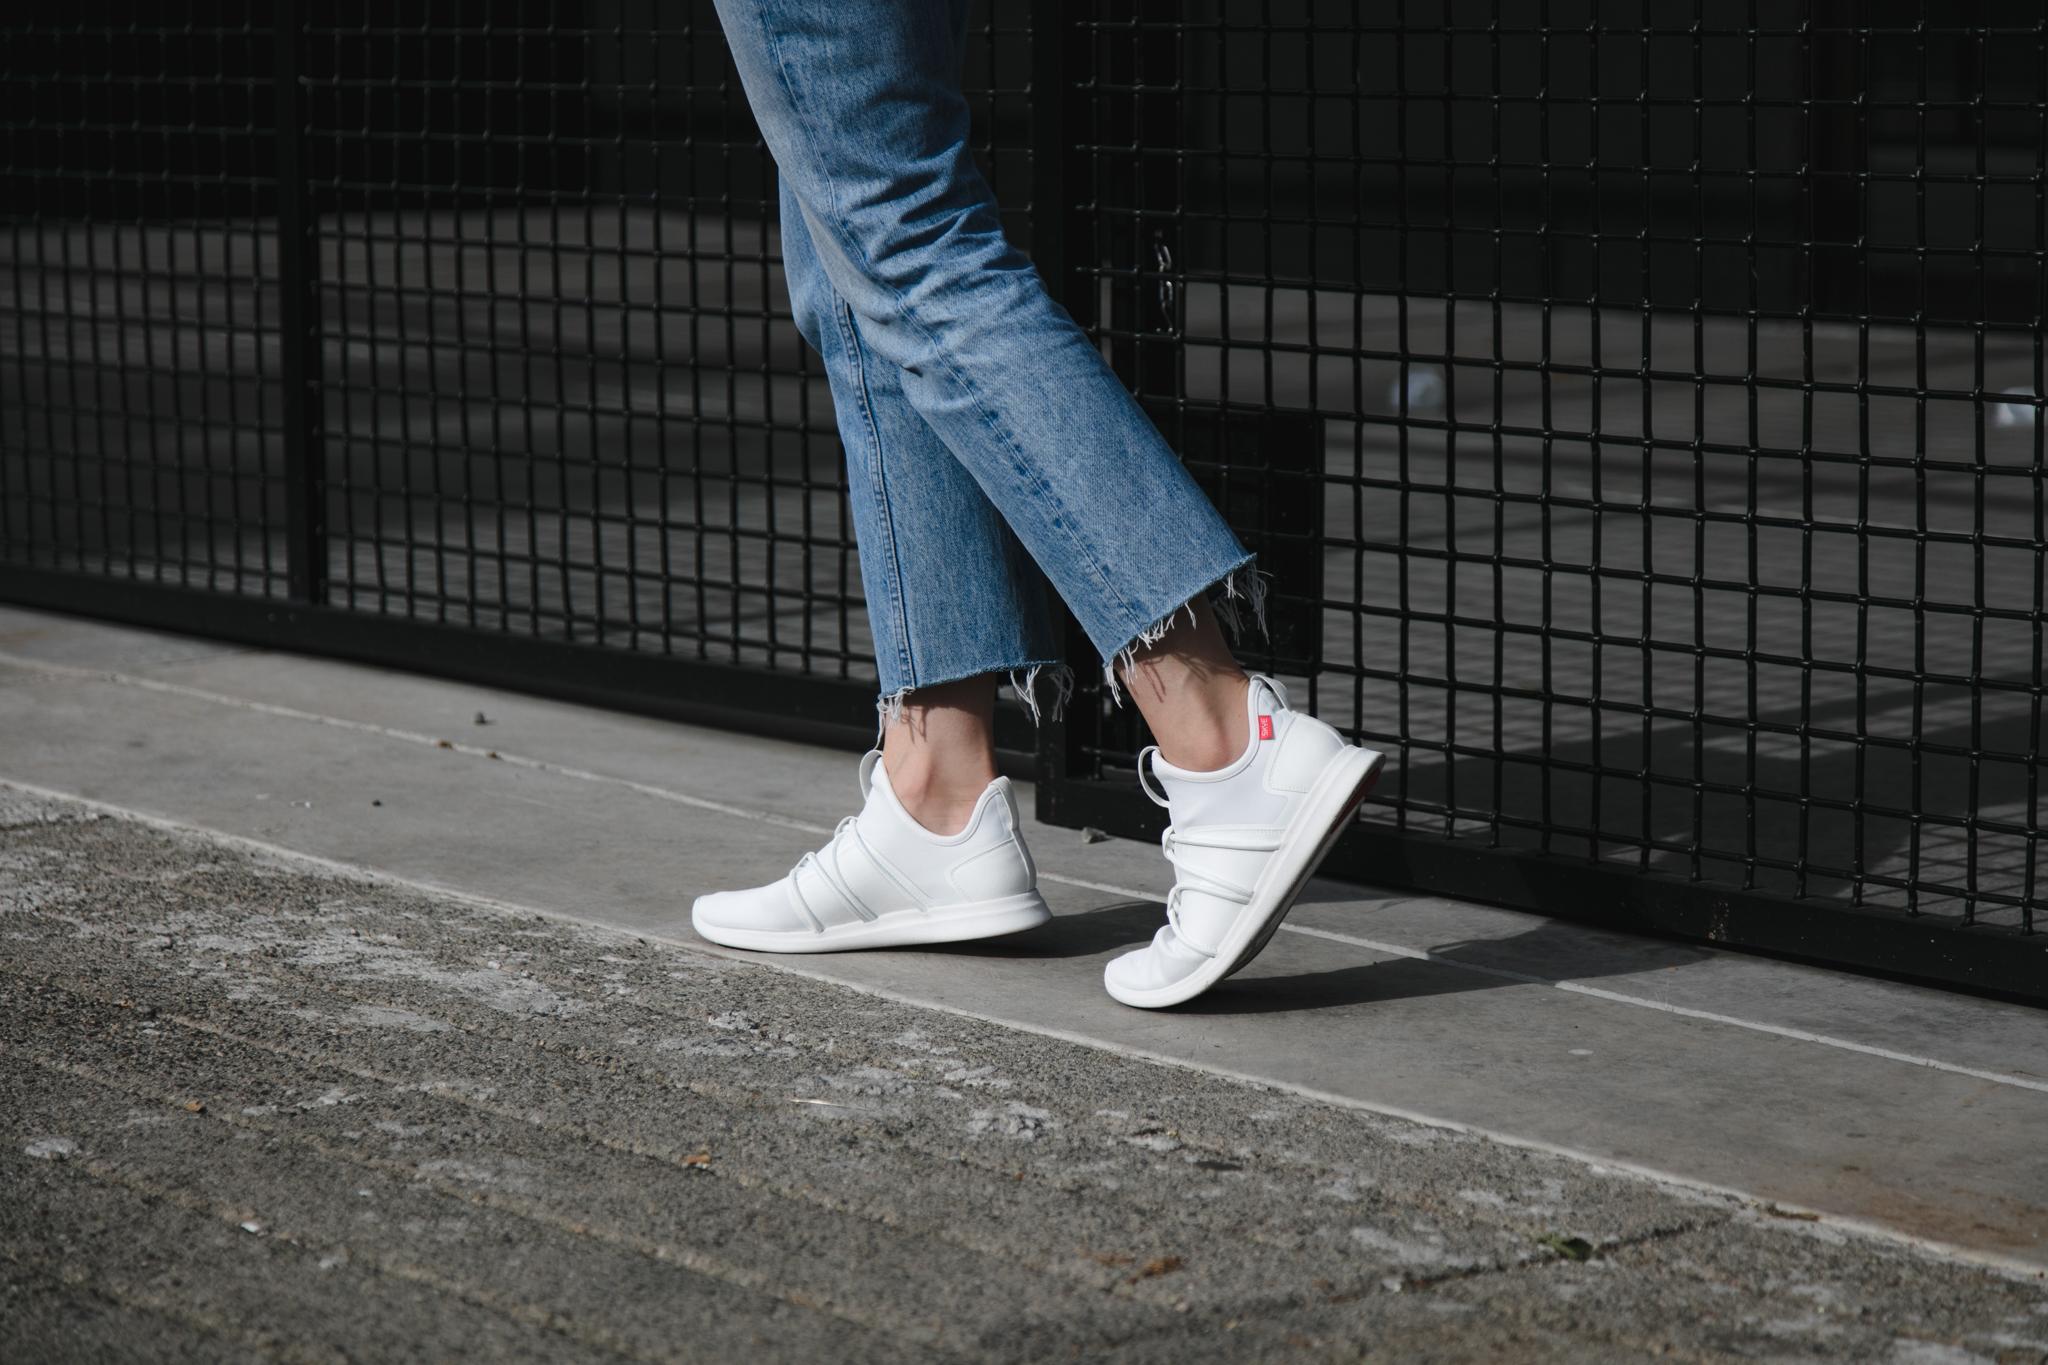 sharday-engel-skye-footwear-daniel-wellington-helmut-lang5865.jpg